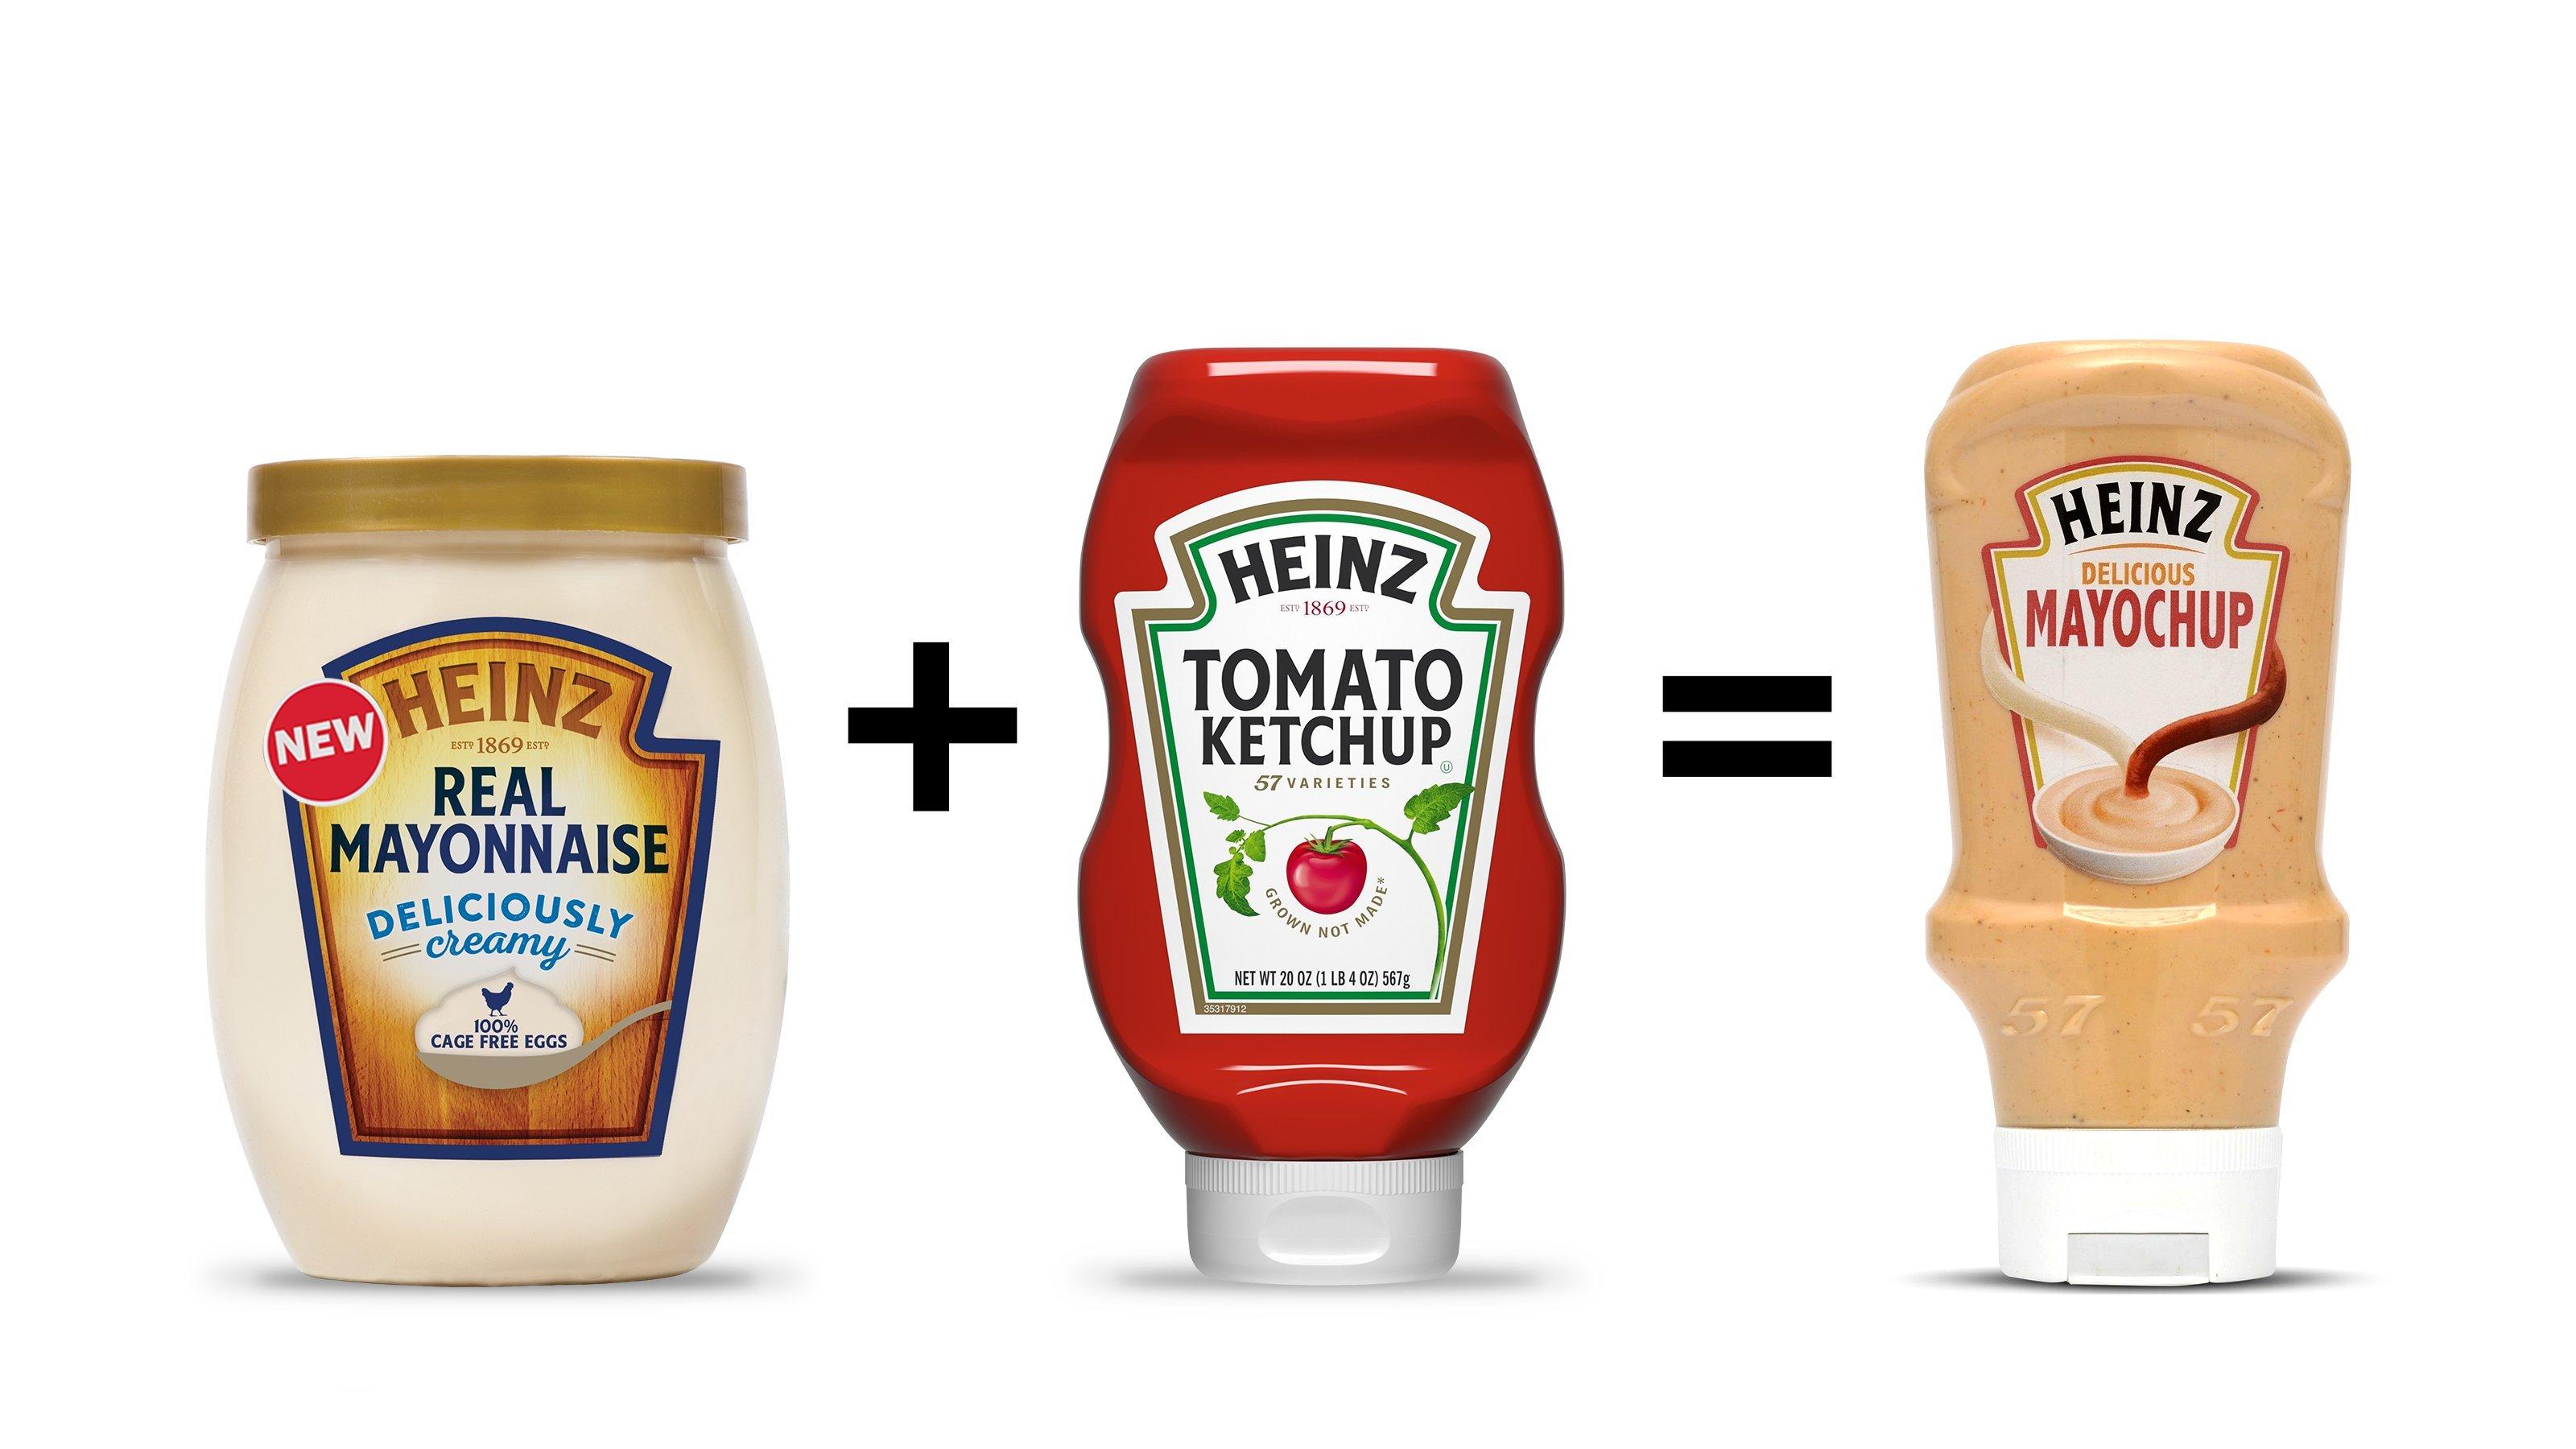 Heinz番茄醬的行銷新手段!3個技巧風靡社群網站